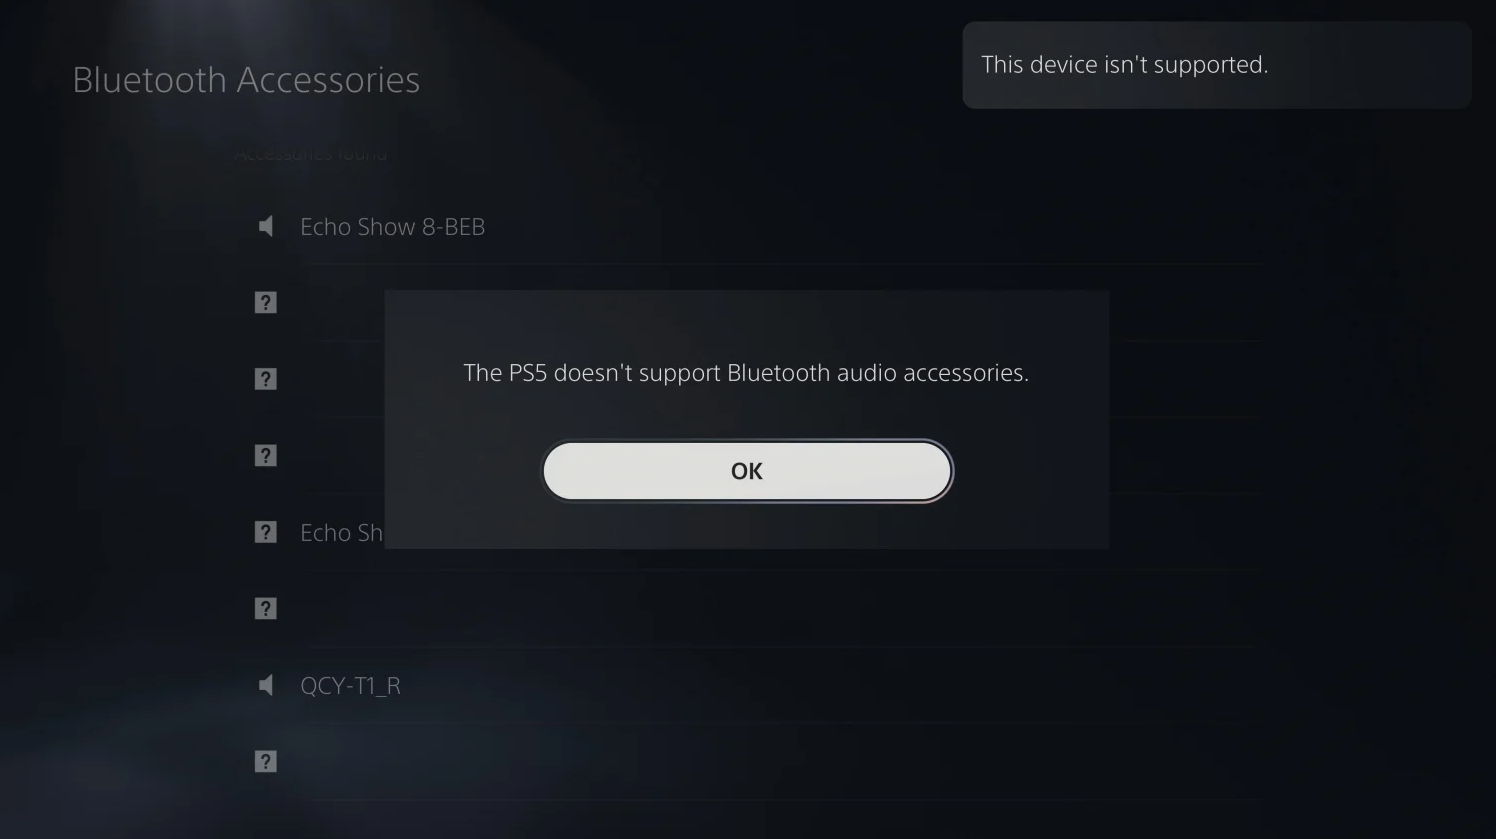 PS5现在不支撑蓝牙音频设备 索尼自家耳机也不可